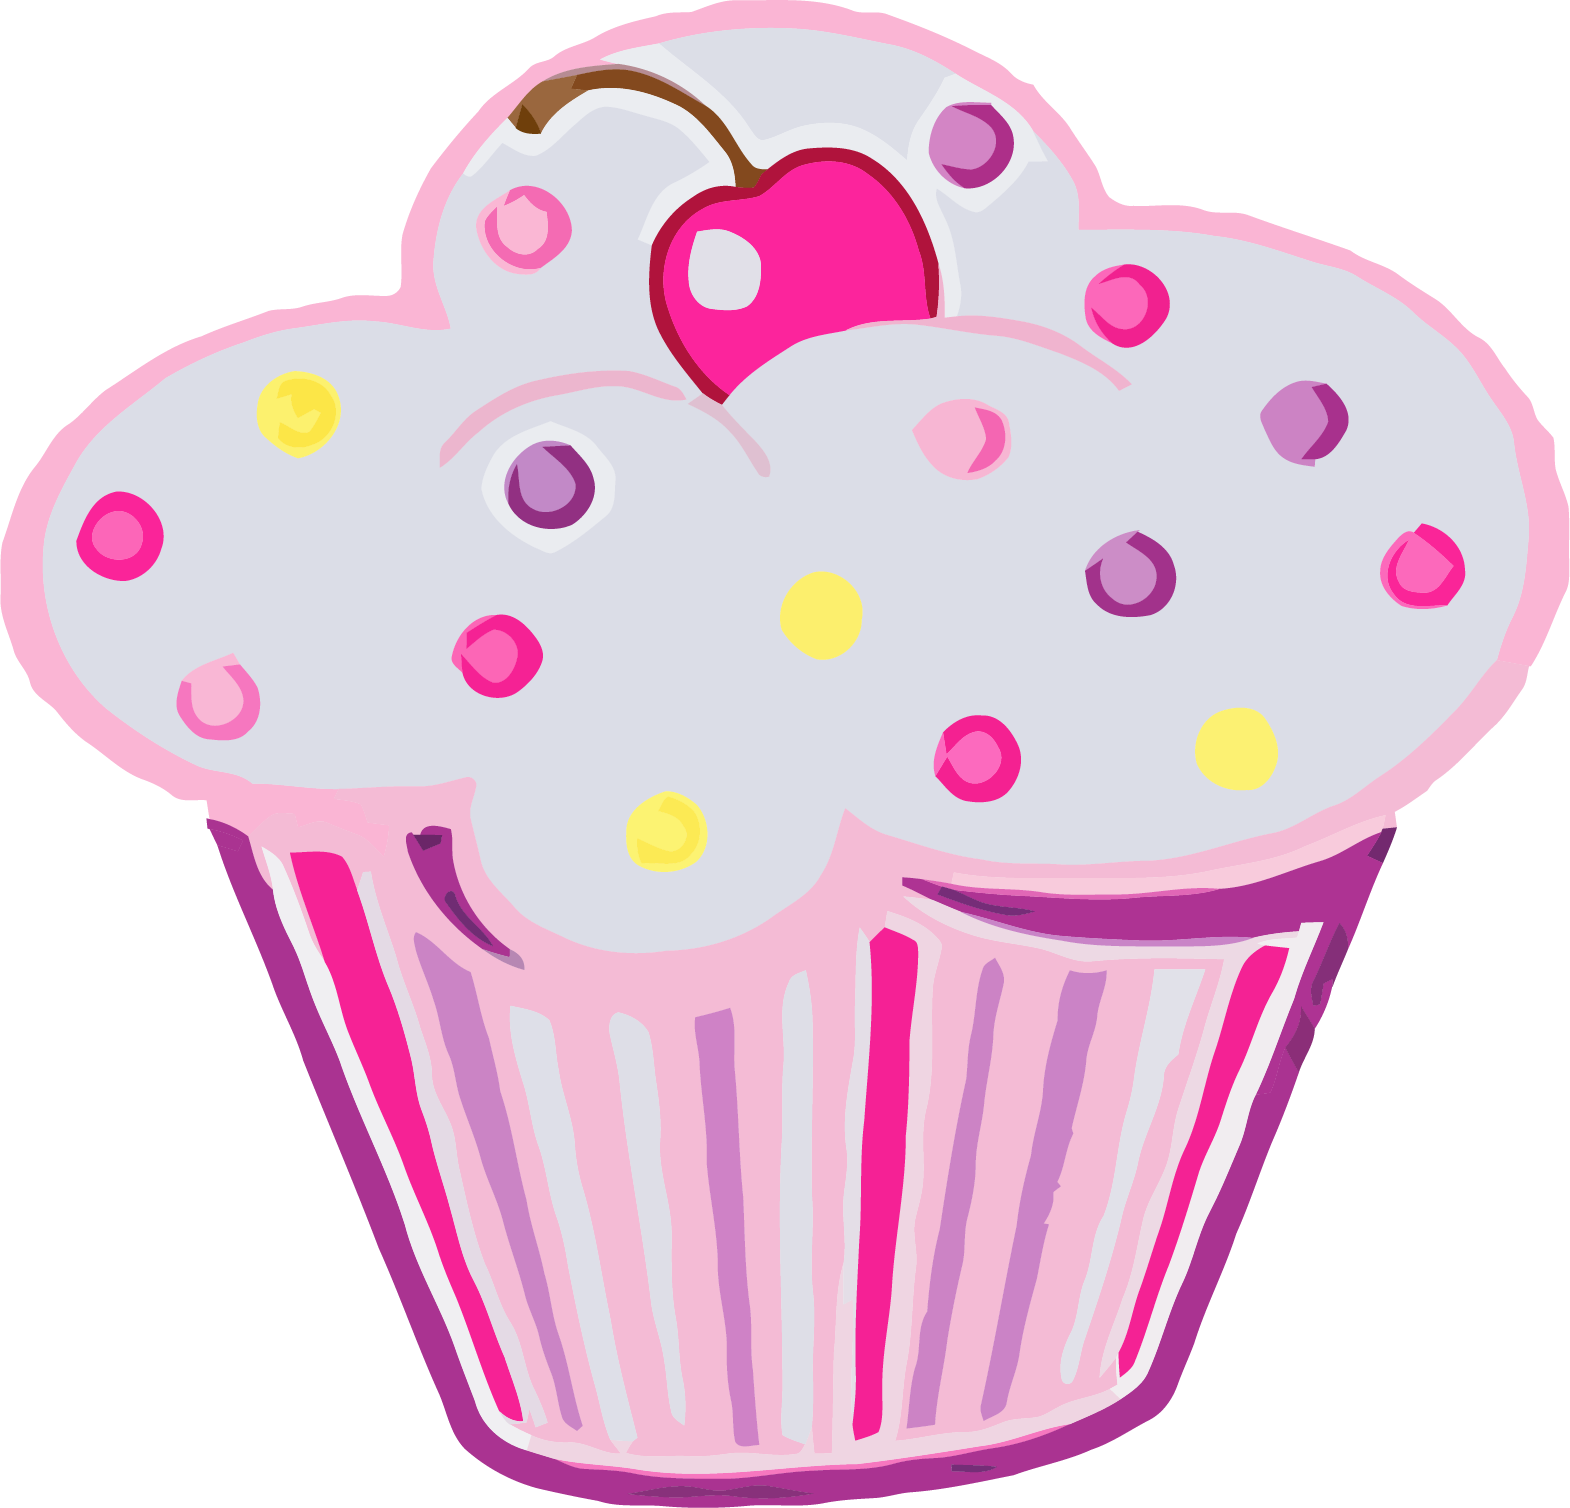 Png jokingart com download. Food clipart cupcake